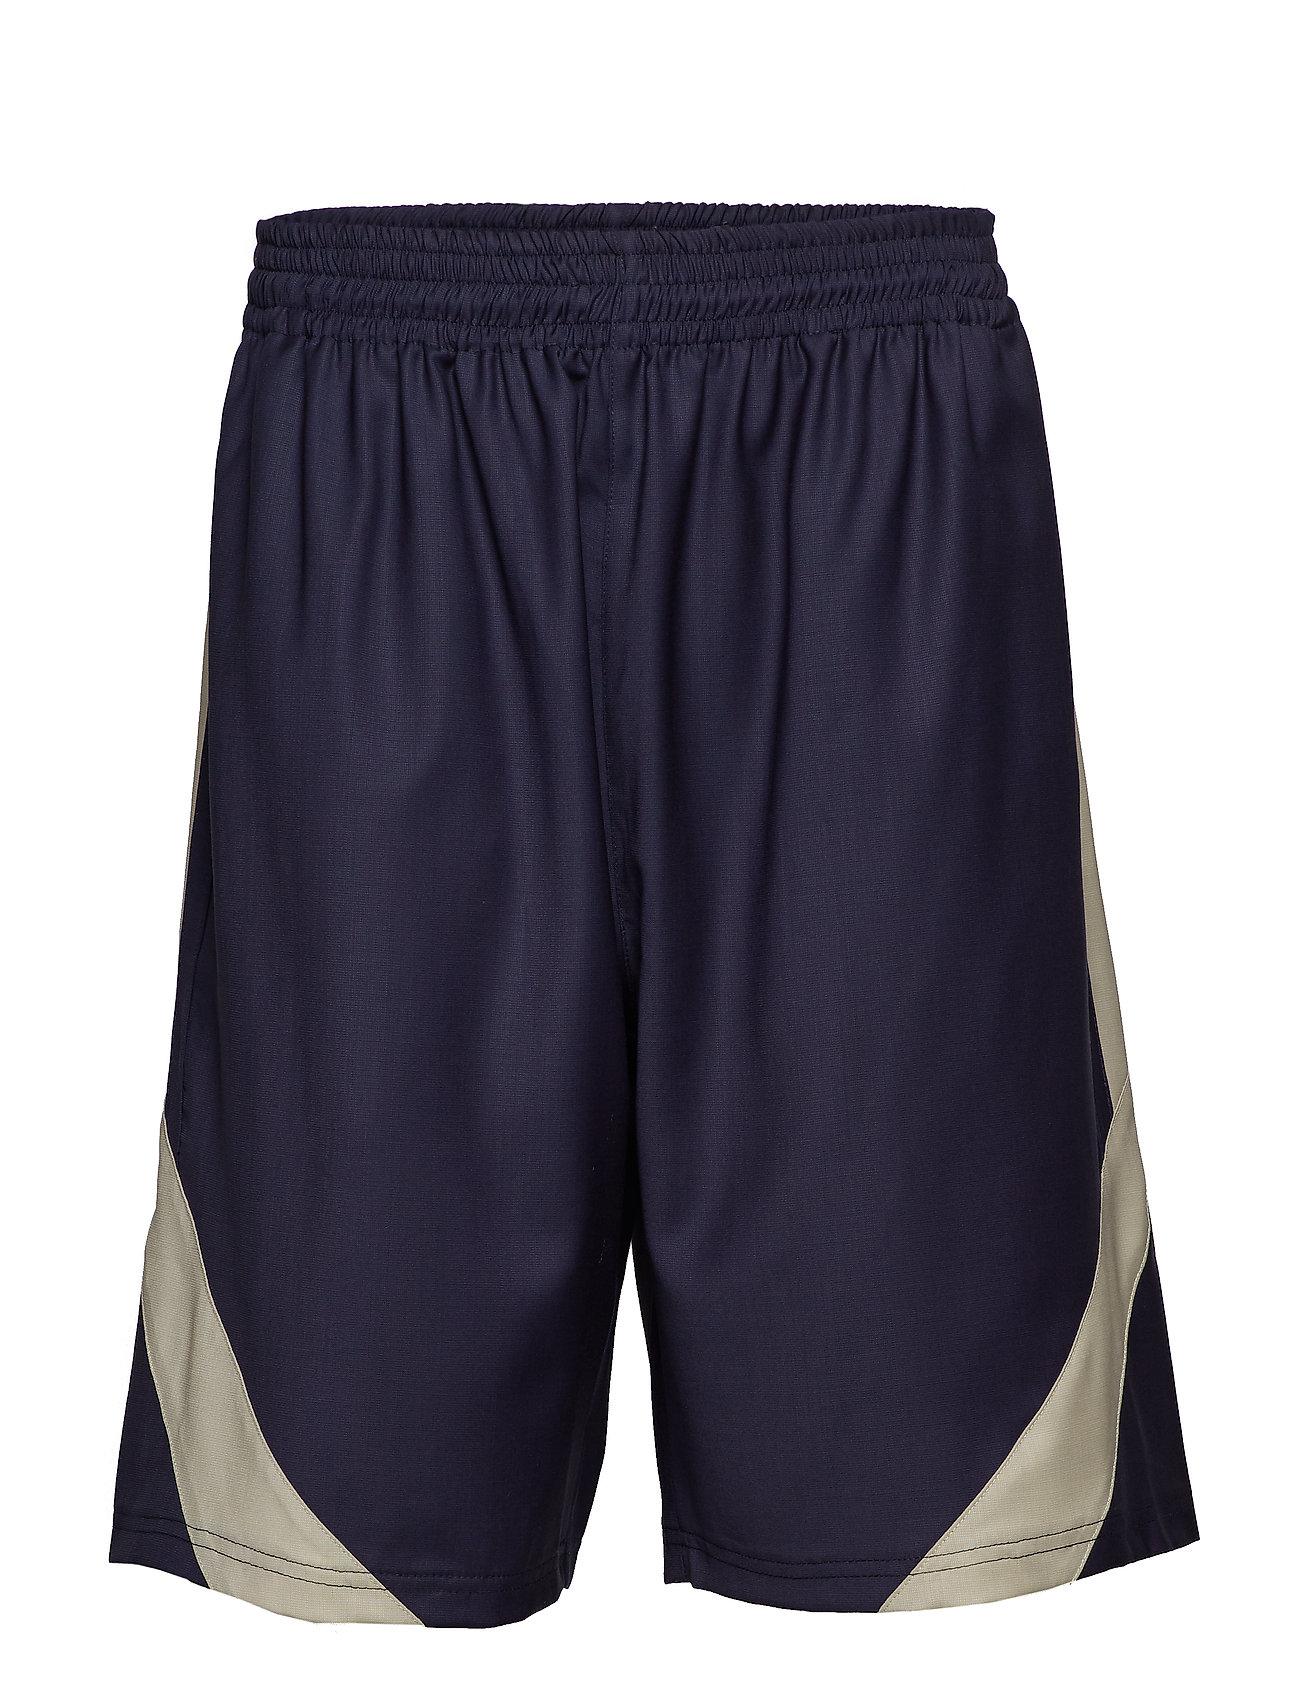 Martin Asbjørn NEAL SHORTS Shorts